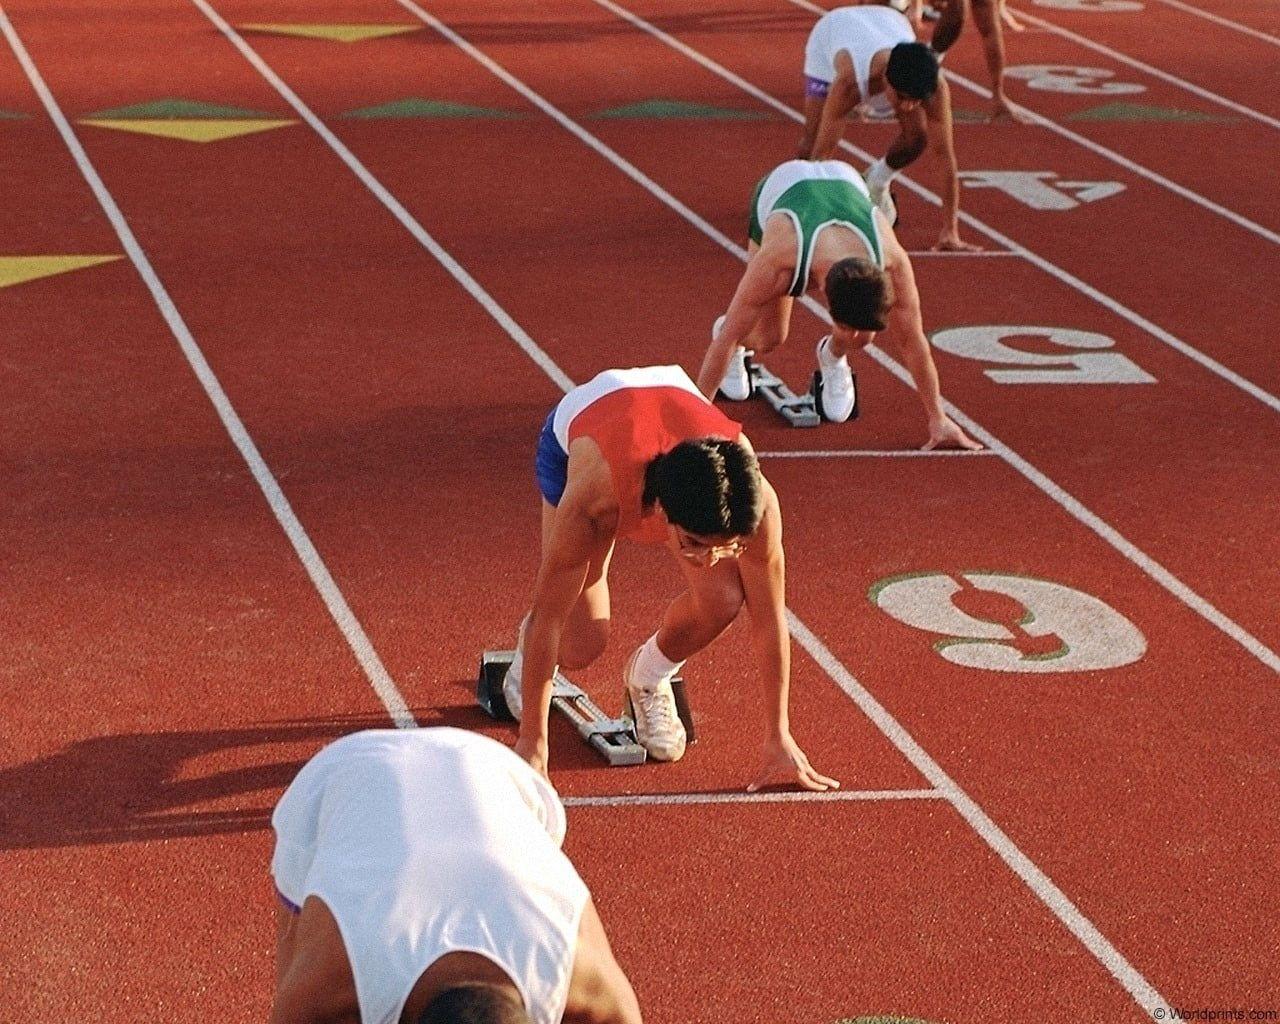 Track And Field Athletics Start Run Stadium 720p Wallpaper Hdwallpaper Desktop In 2020 Track And Field How To Start Running Athlete